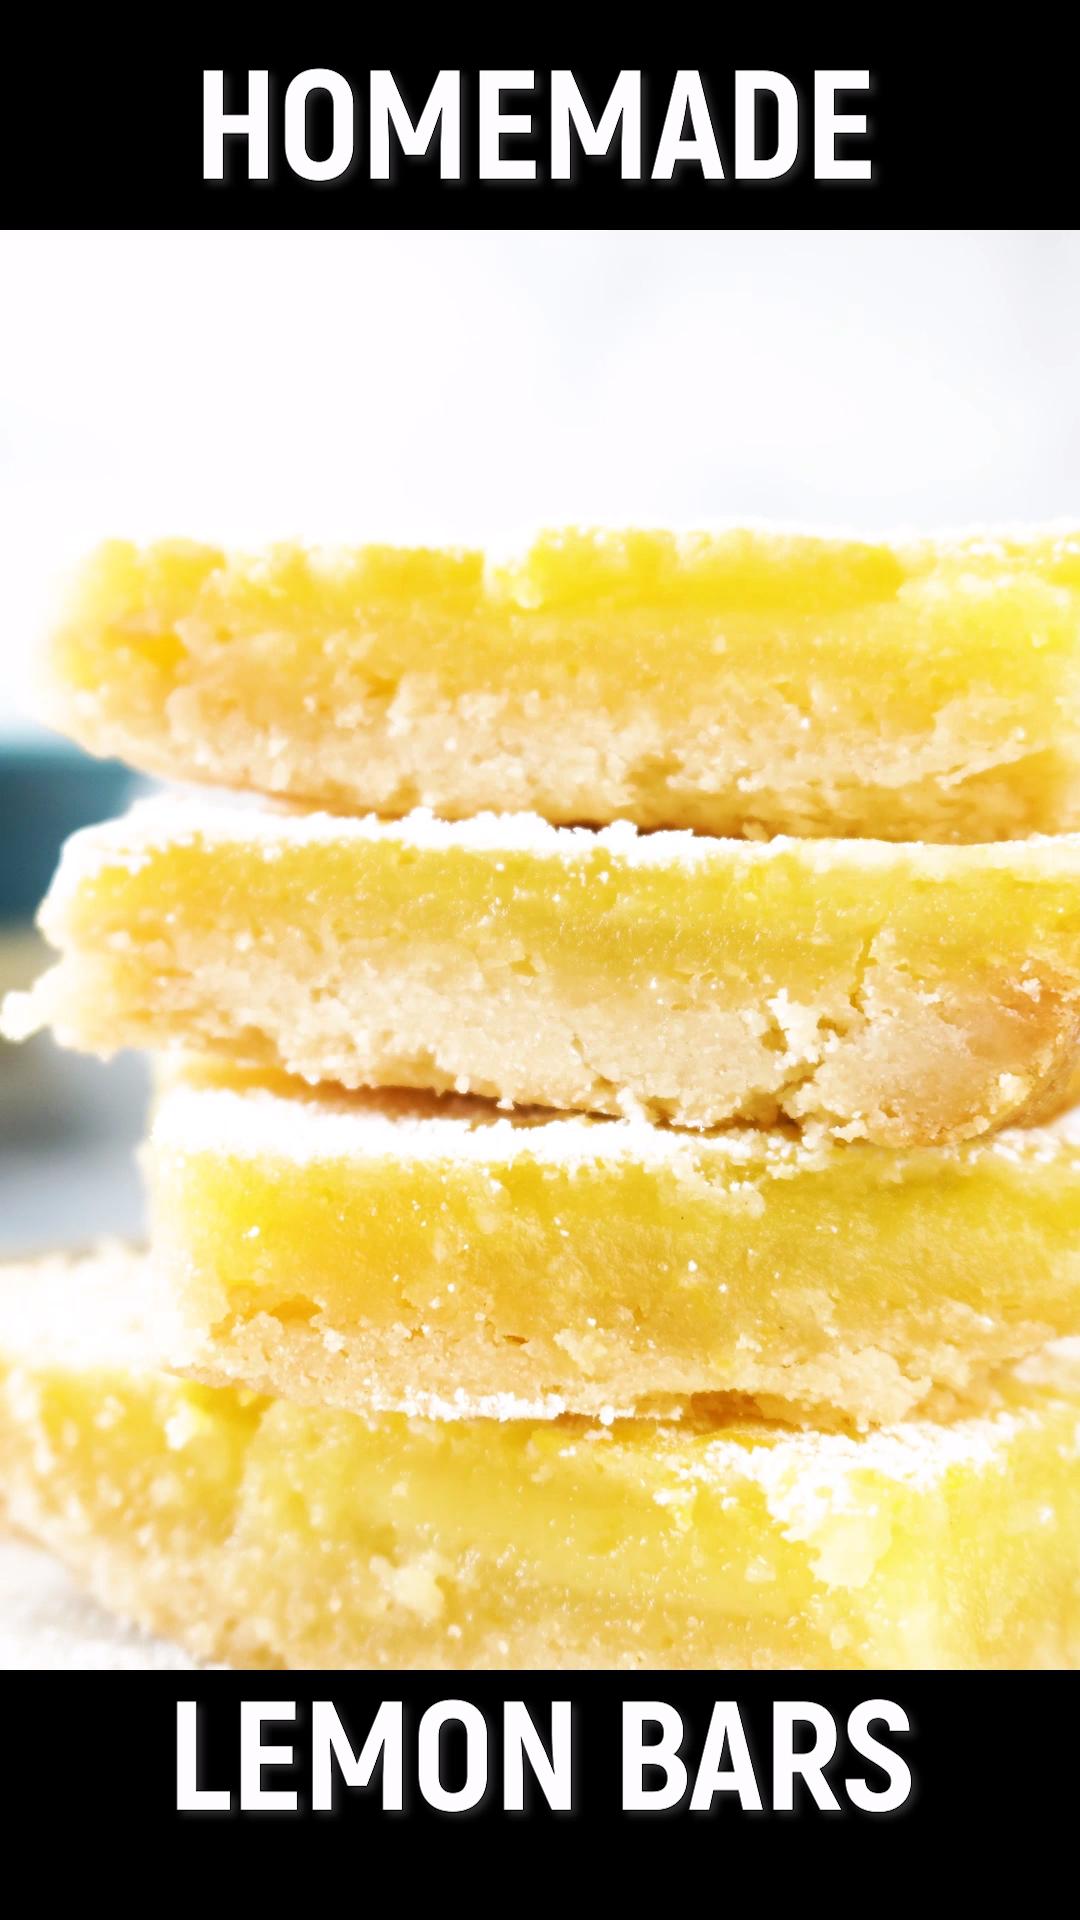 Homemade Lemon Bars Recipe- easy to make and delicious! Enjoy this refreshing lemon bars recipe that's prefect for dessert or a fun treat! #lemonbars #lemonsquares #homemade #dessert #lemon #forkids #easy #summer #atablefullofjoy #simple